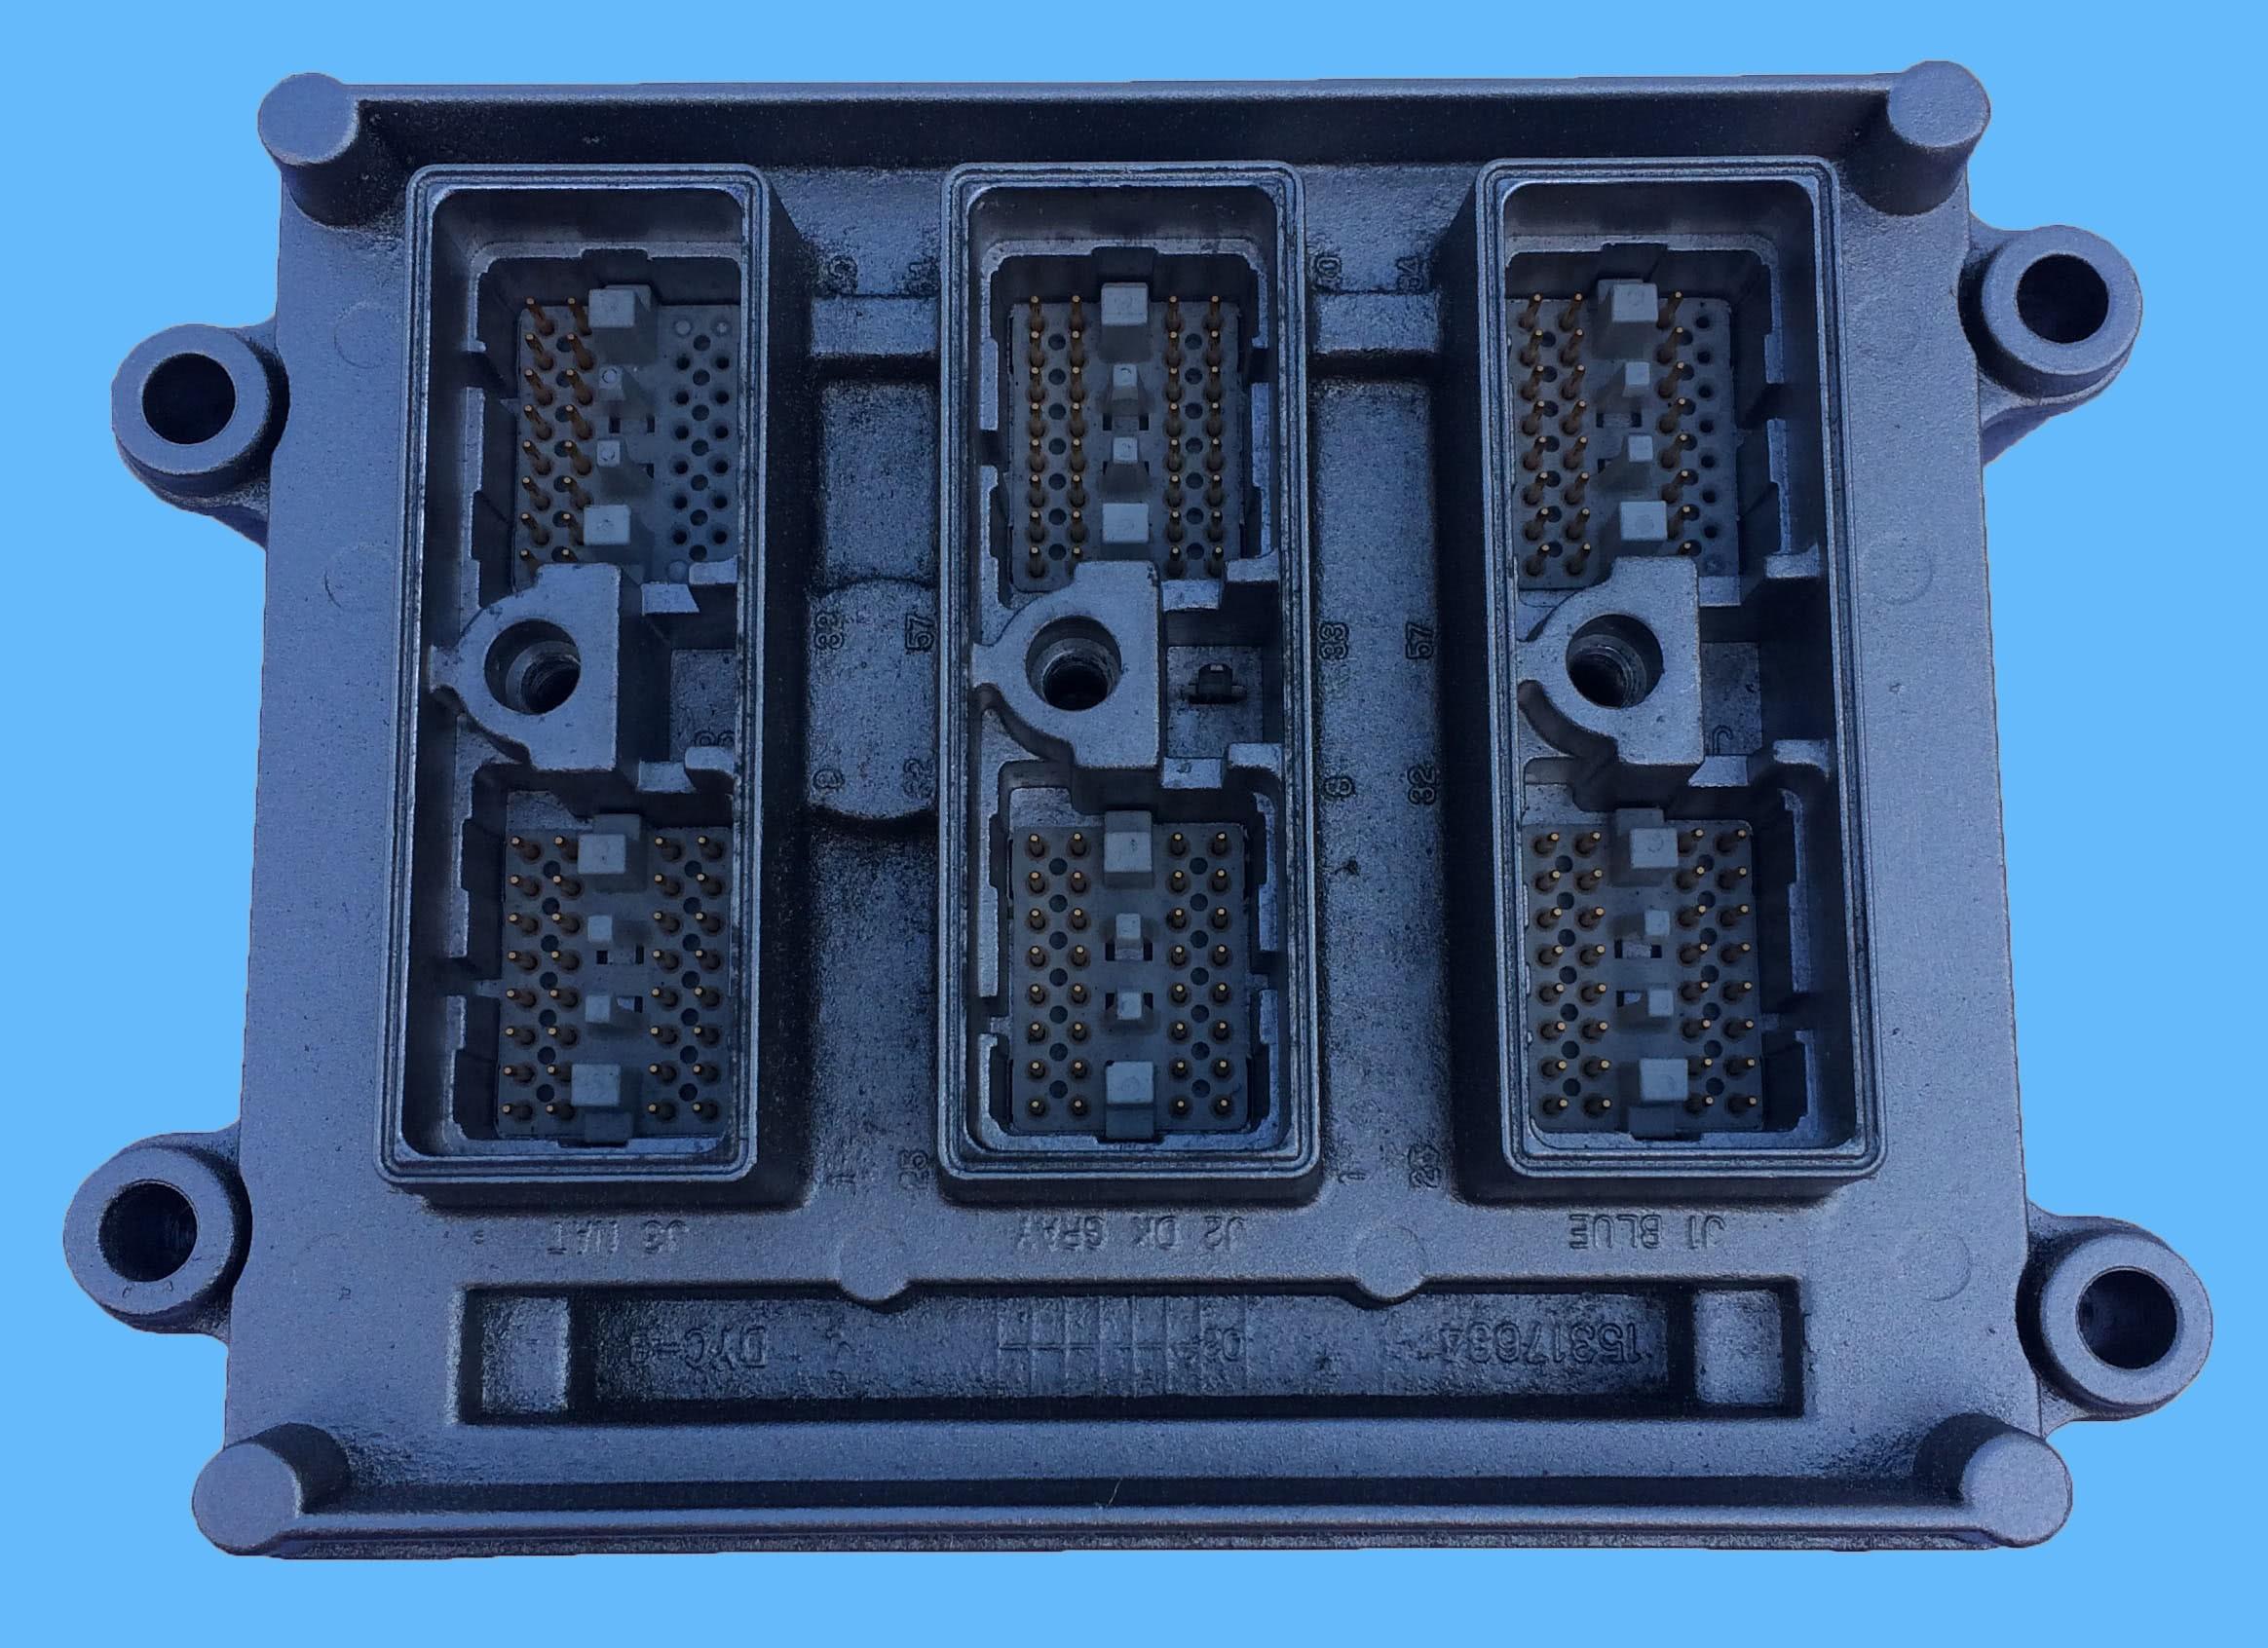 2000 Chevrolet Trailblazer 4.3L V6 Gas Engine Control Module ECM / ECU - Engine Control Module